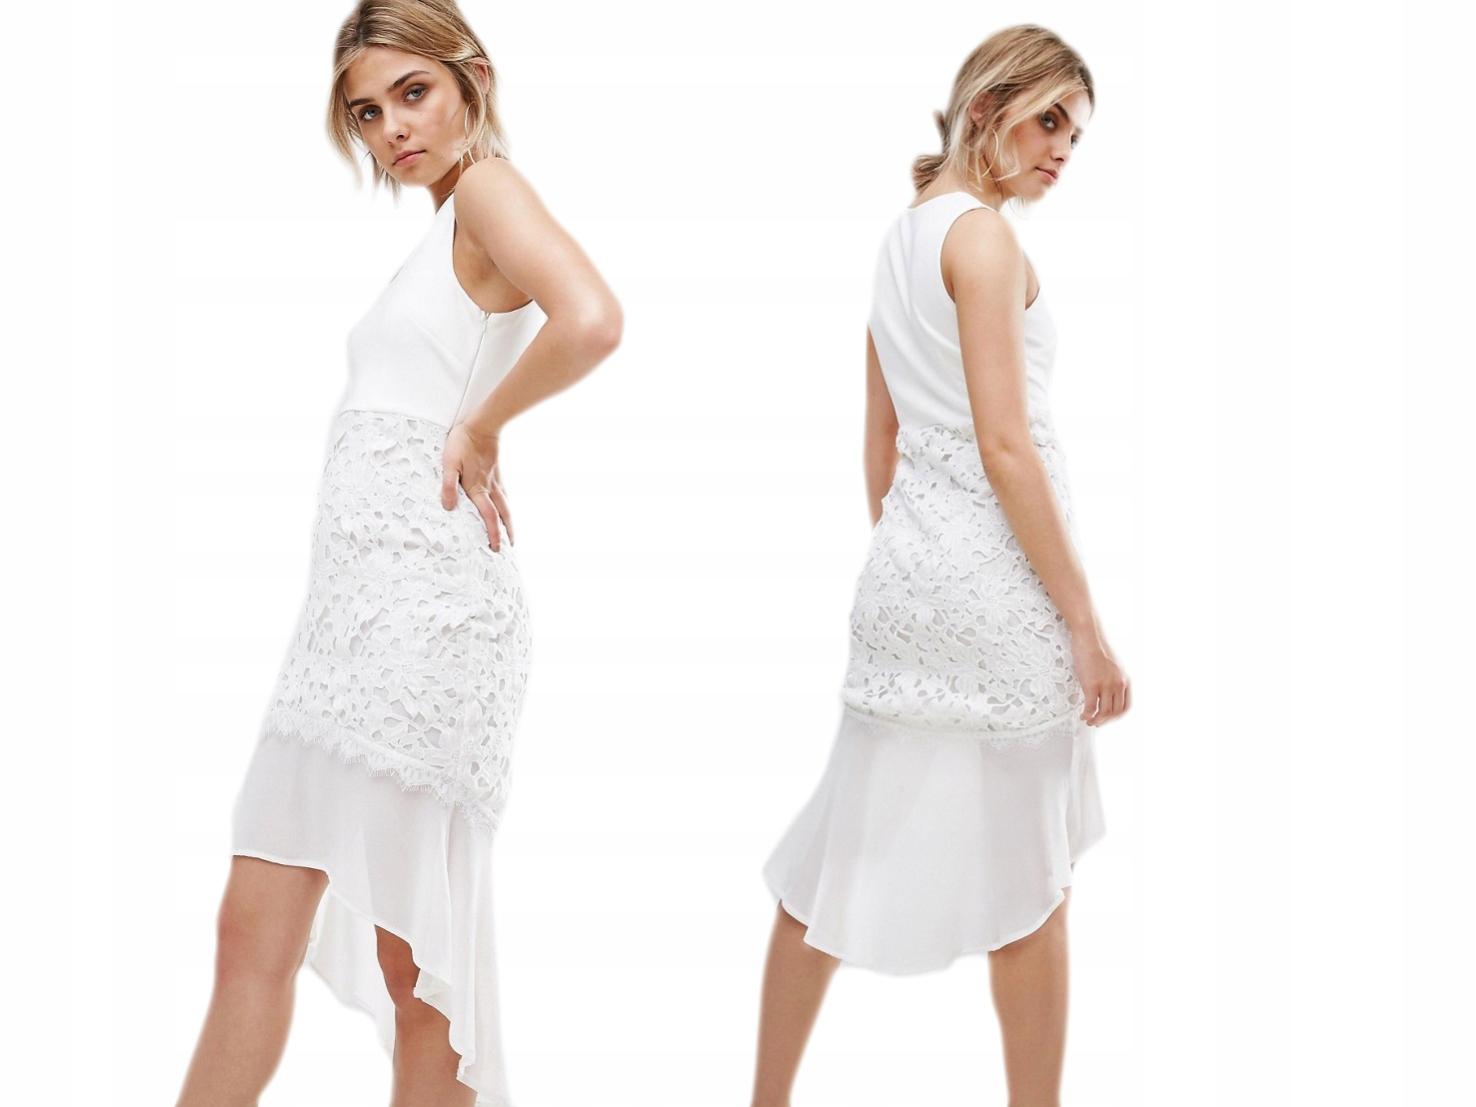 Boohoo kremowa sukienka z falbanka boho 44